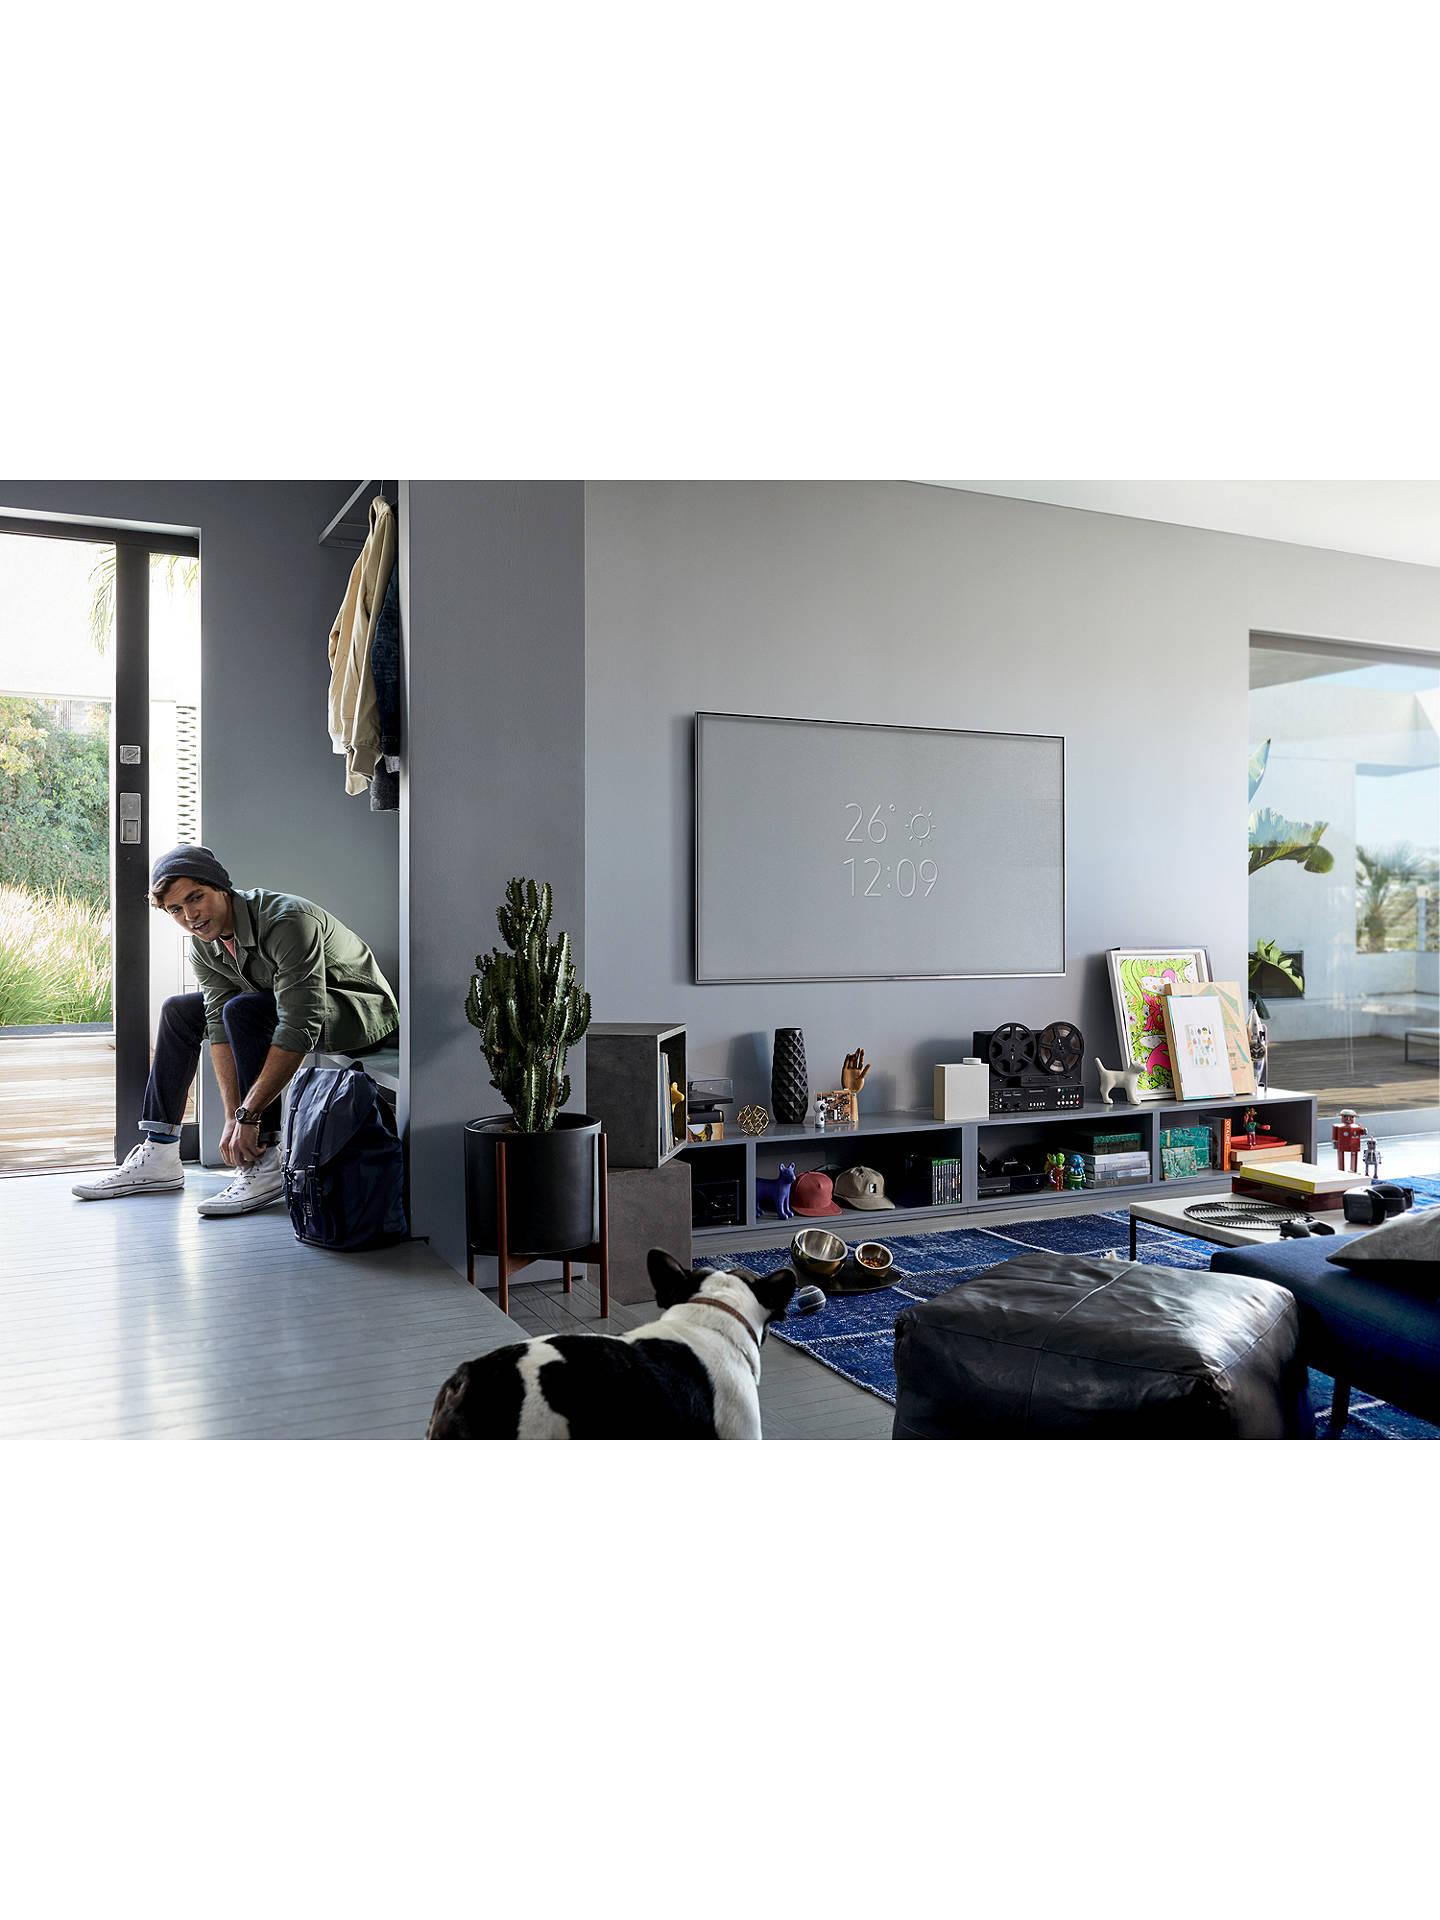 Samsung QE55Q6FN (2018) QLED HDR 1000 4K Ultra HD Smart TV, 55